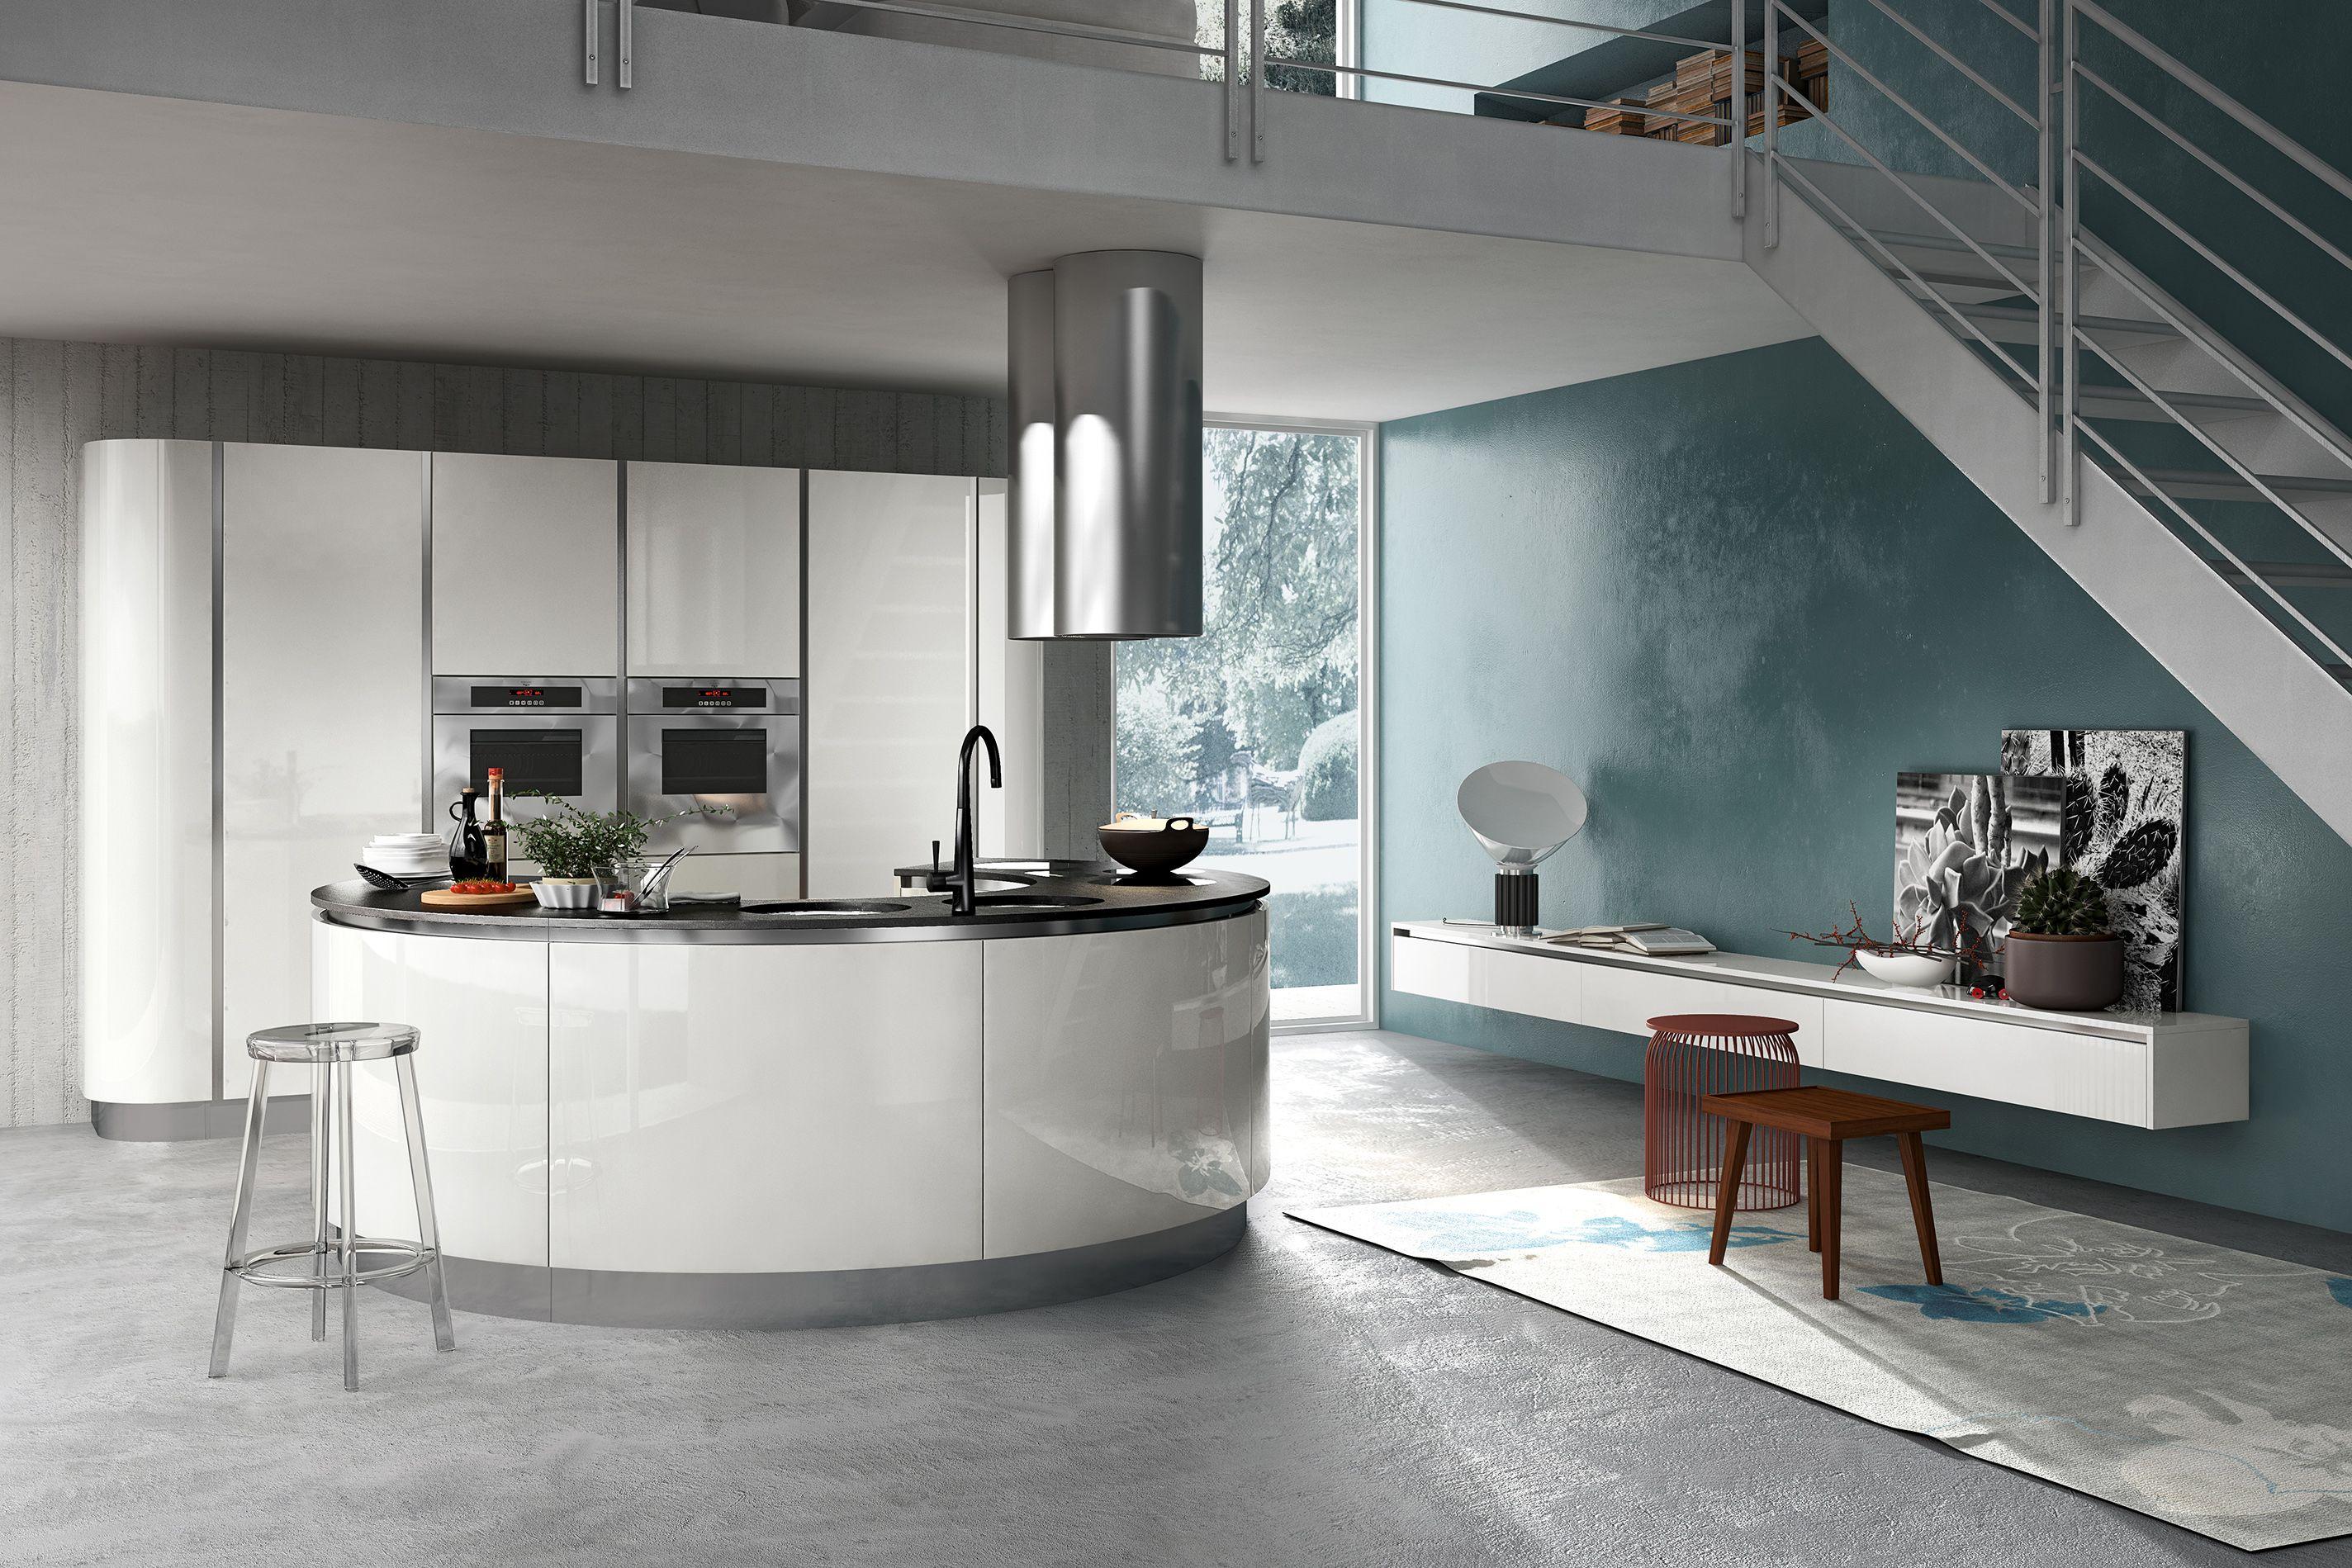 Armony Cucine Model Sigma Cuisine Design Moderne Ilot De Cuisine Rond Ilot De Cuisine Moderne